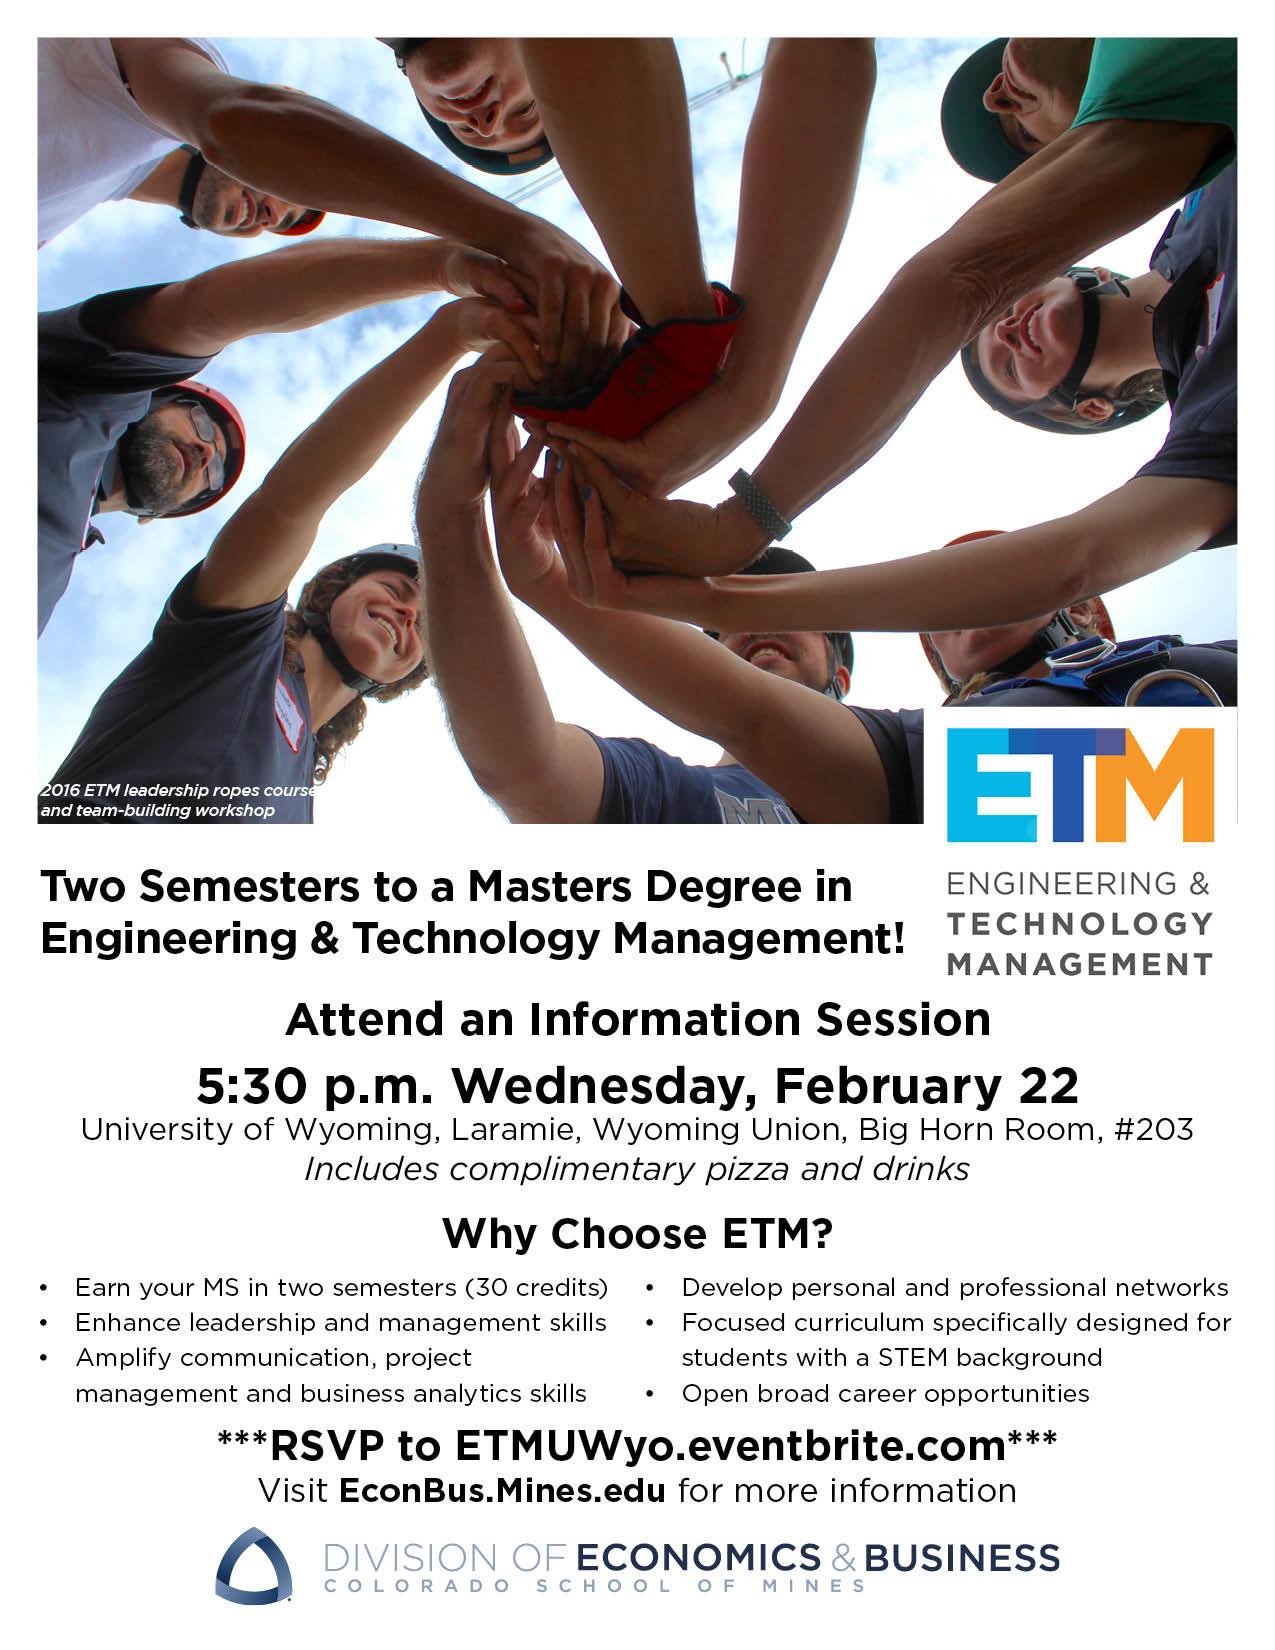 Mines ETM info session